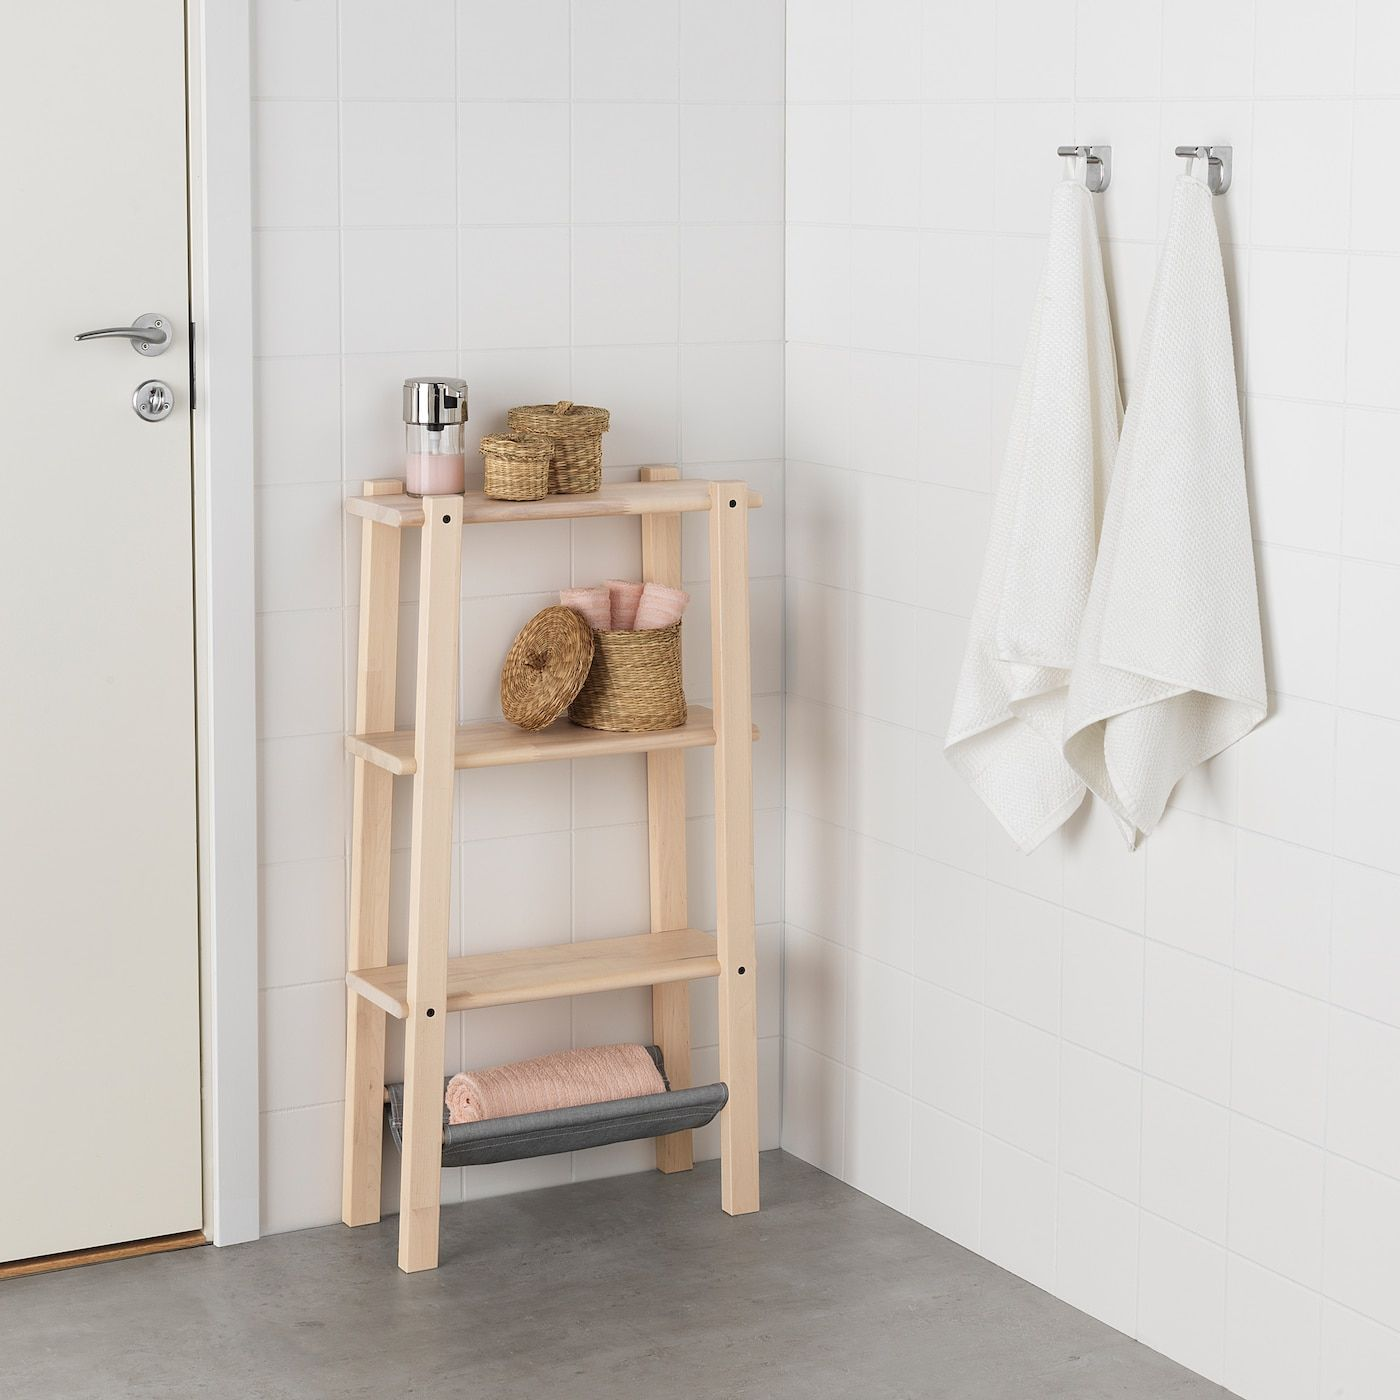 Ikea Vilto Birch Shelf Unit In 2020 Shelves Ikea Small Bathroom